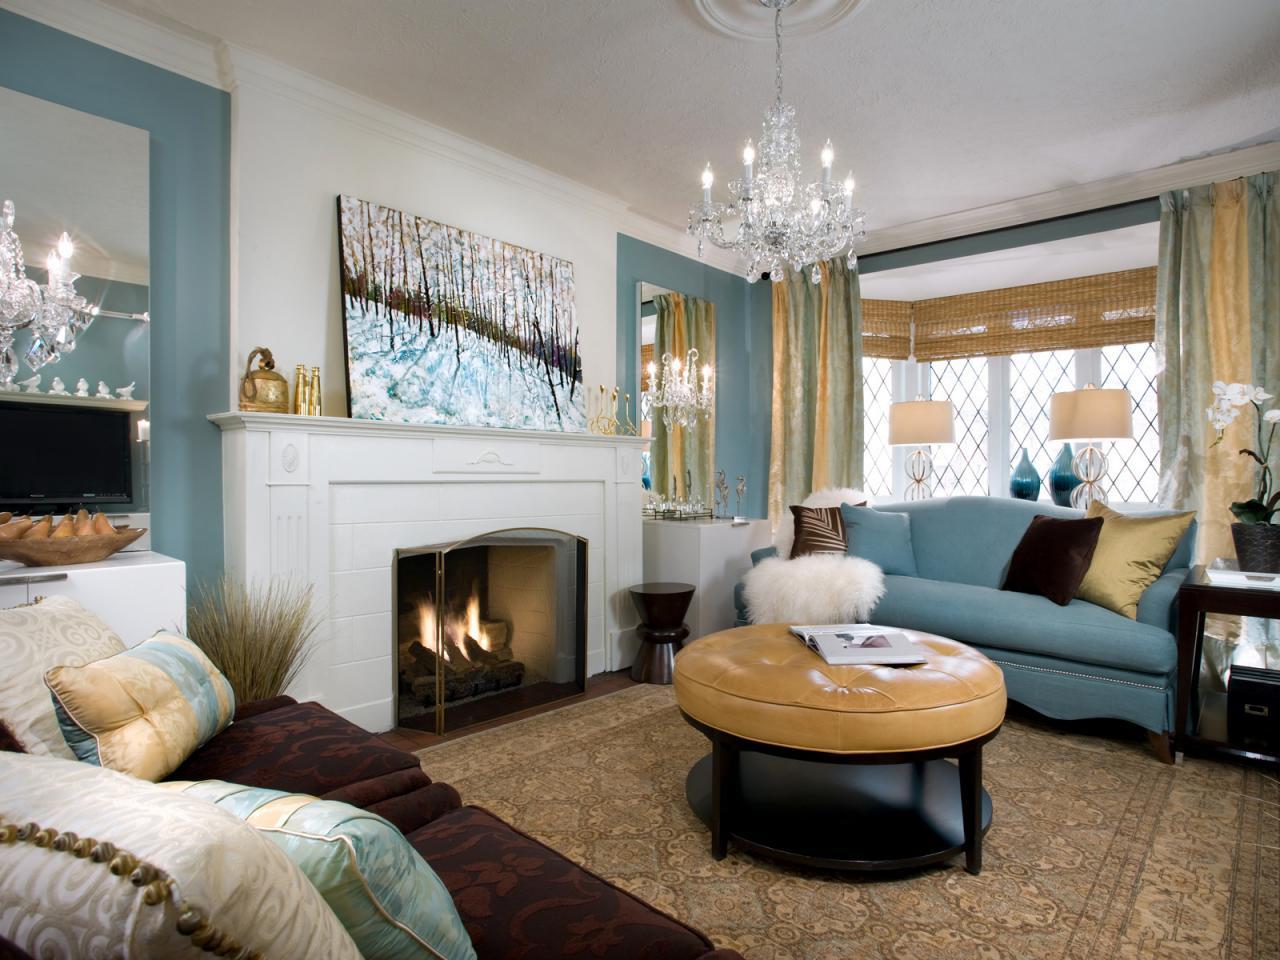 candice olson bedroom fireplace photo - 1